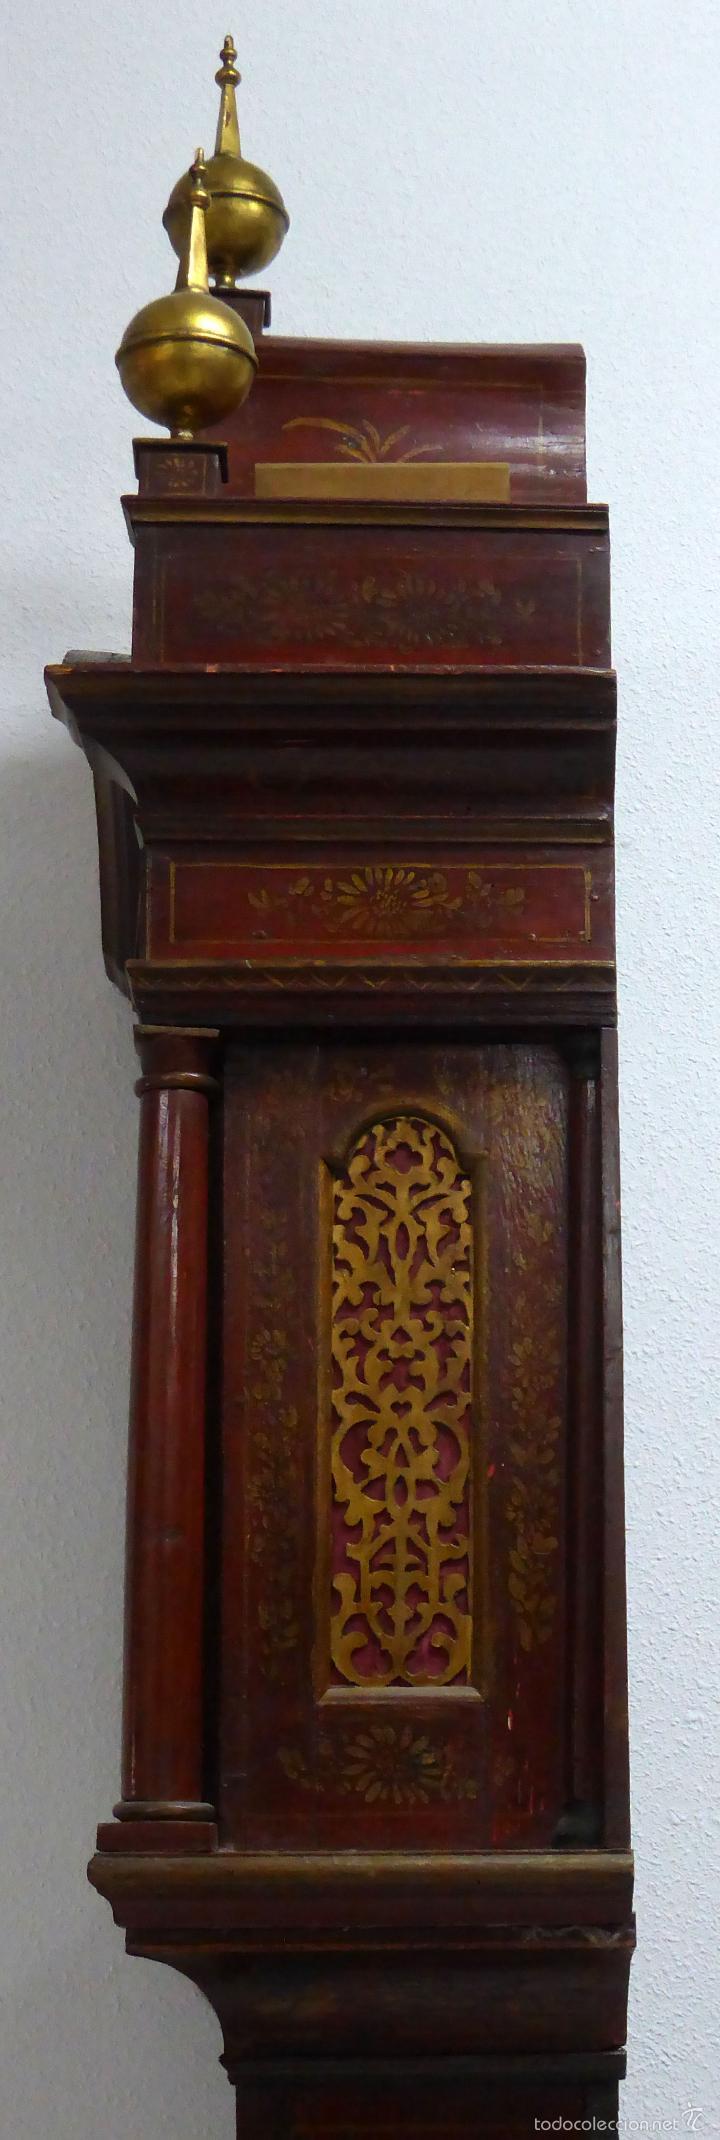 Relojes de pie: Reloj pie inglés laca japanning chinoseries S XVIII Maquinaria William Fidgett London Funciona - Foto 23 - 58294331